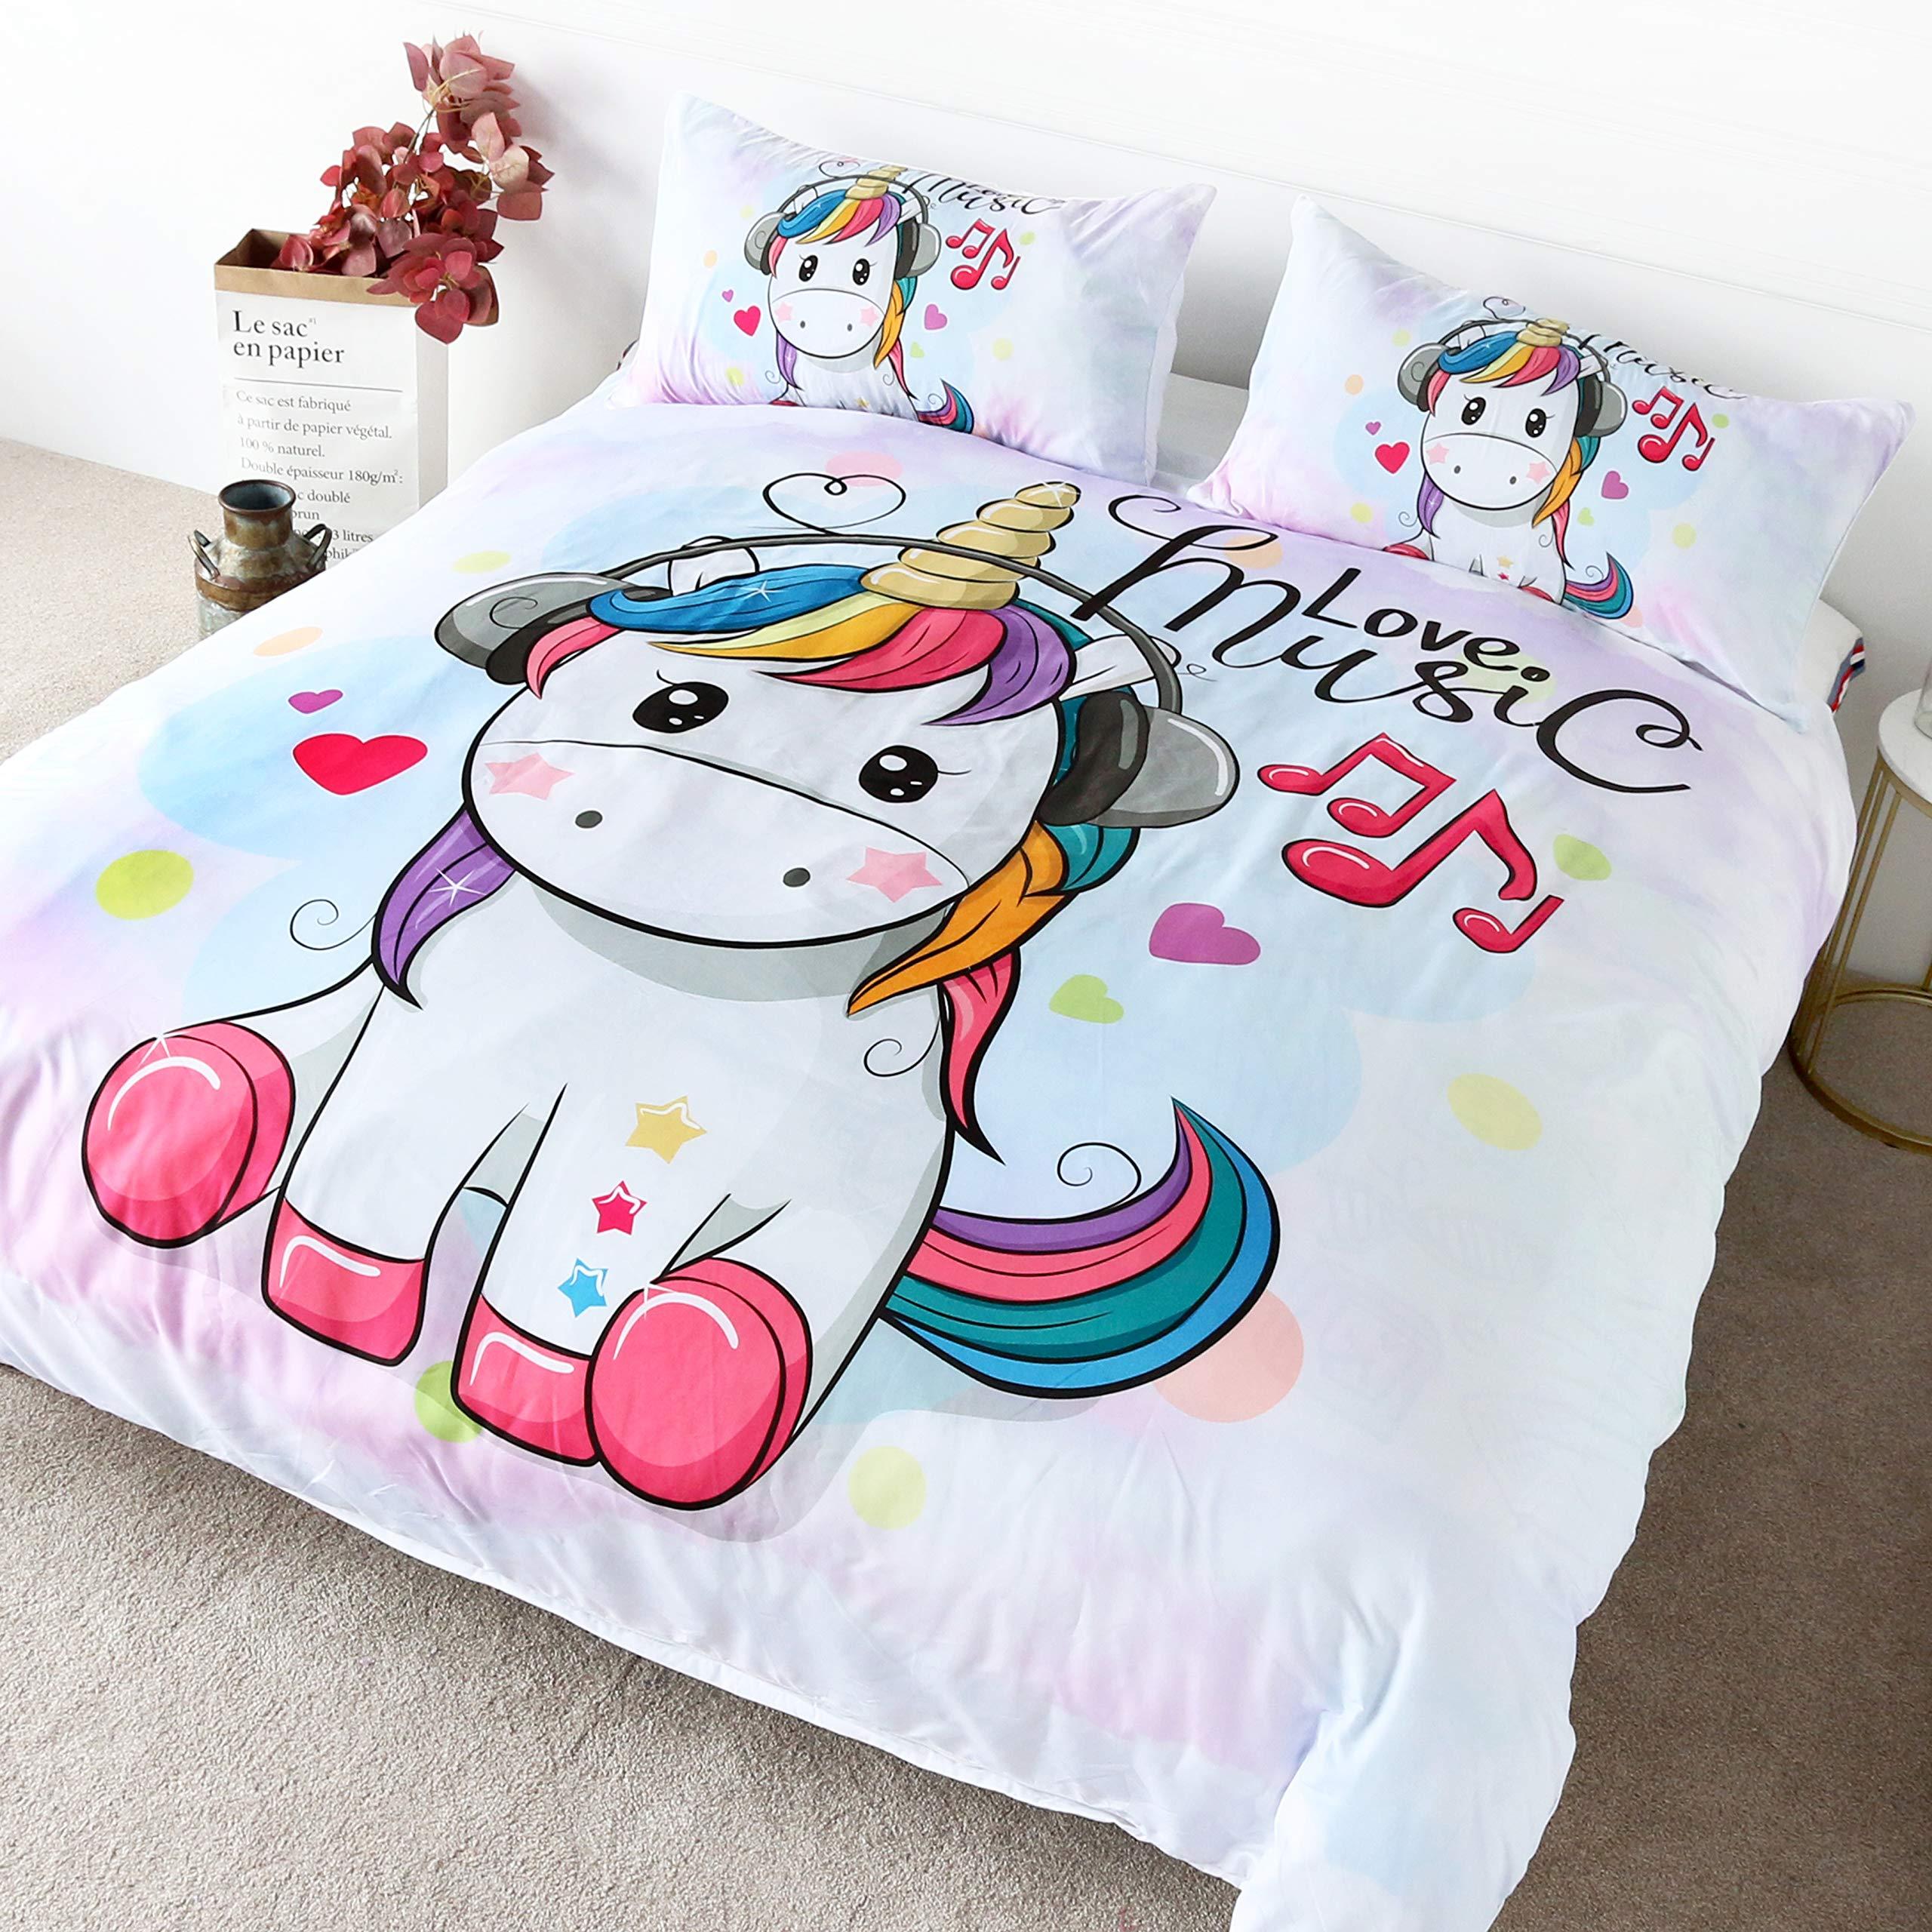 BlessLiving Soft Watercolor Unicorn Bedding 3 Pieces Cute Baby Unicorn Cartoon Wearing Headphones Kids Girls Pink Unicorn Duvet Cover Twin